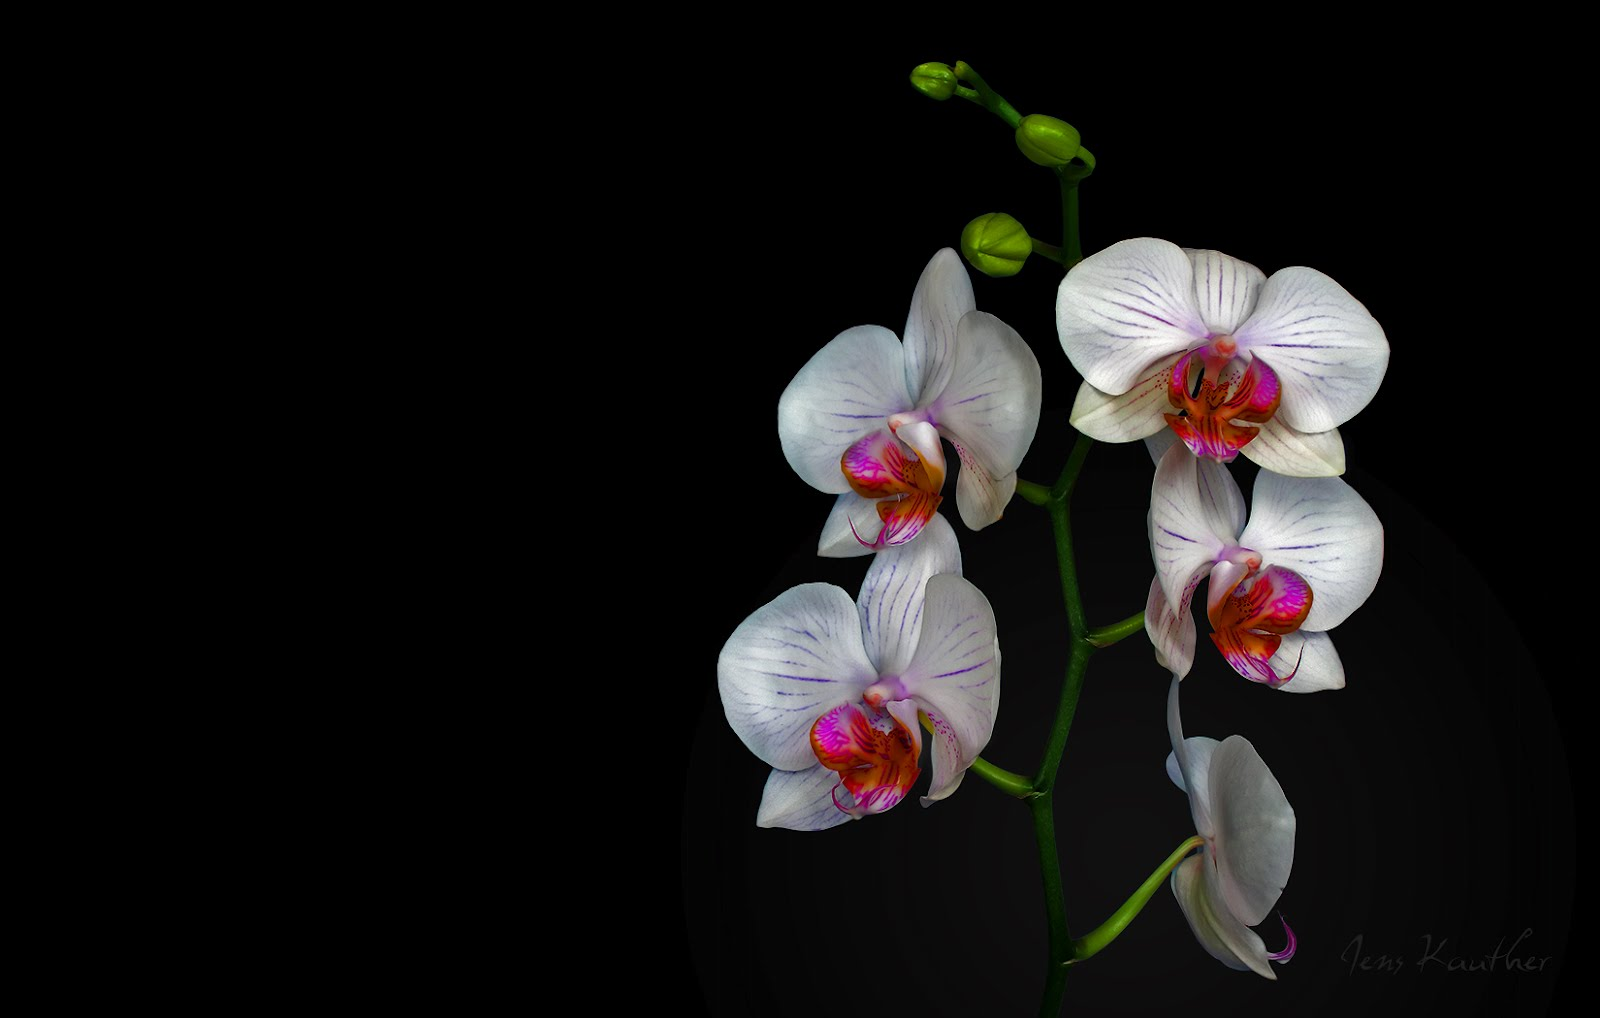 White orchids wallpaper wallpapersafari - White orchid flowers desktop wallpapers ...